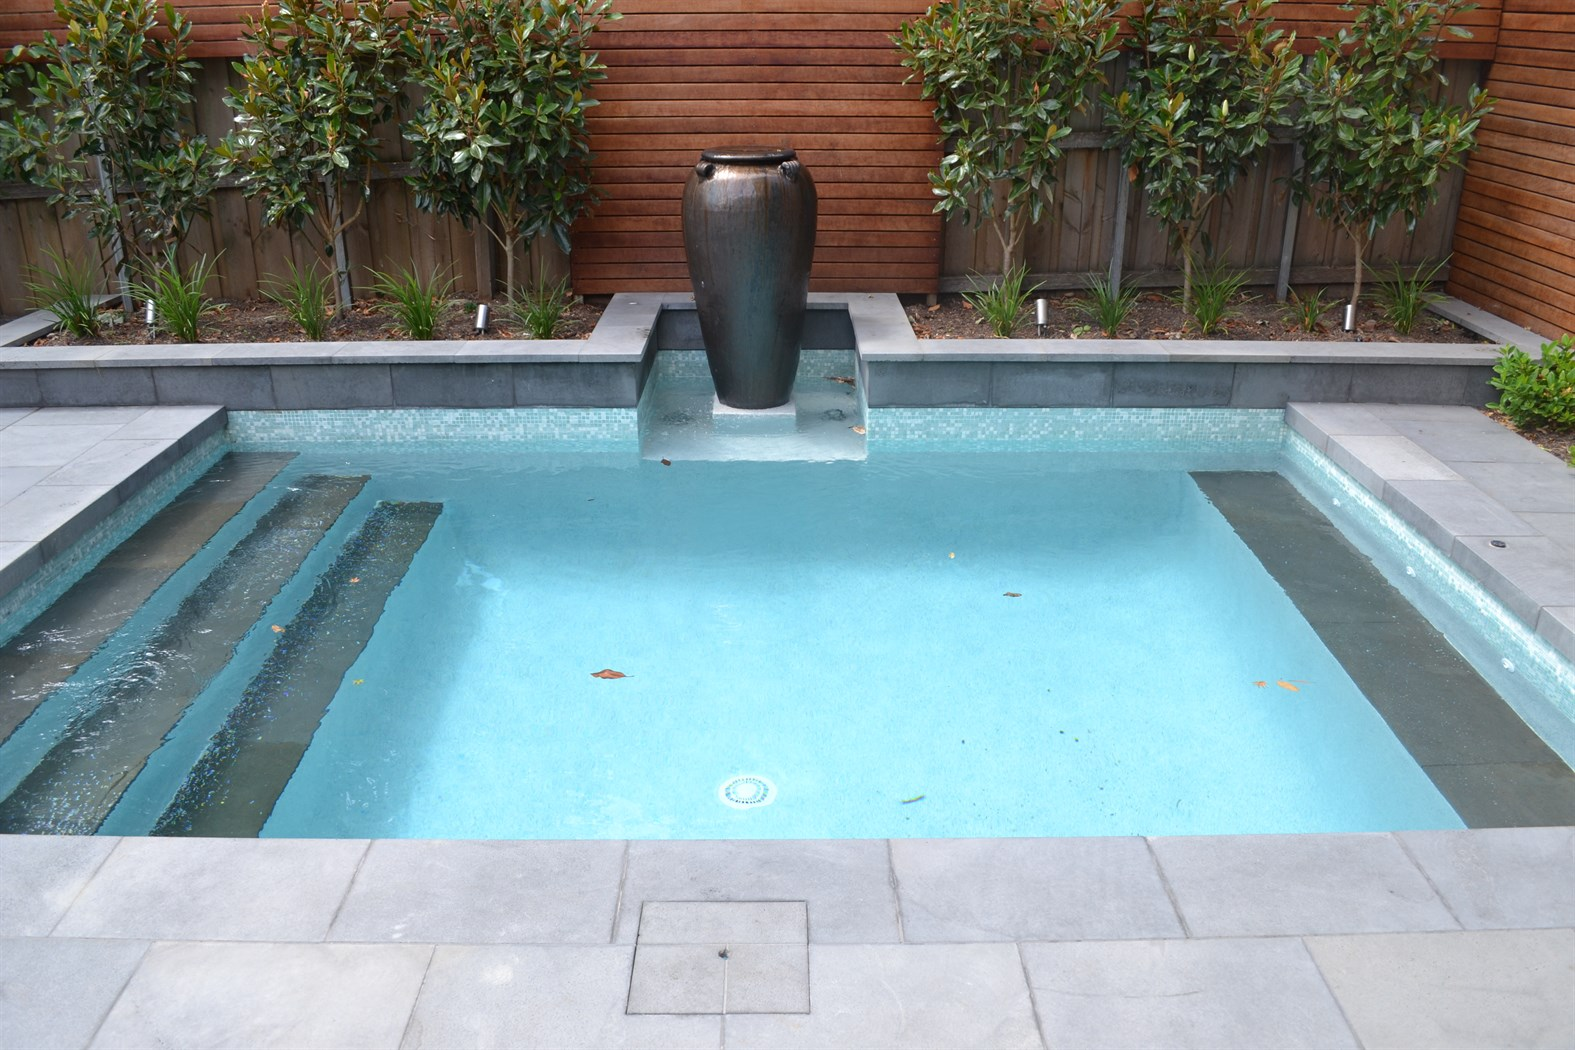 Bluestone Premium Cat Paw Sawn 450 Grit Tiles Pavers Pool